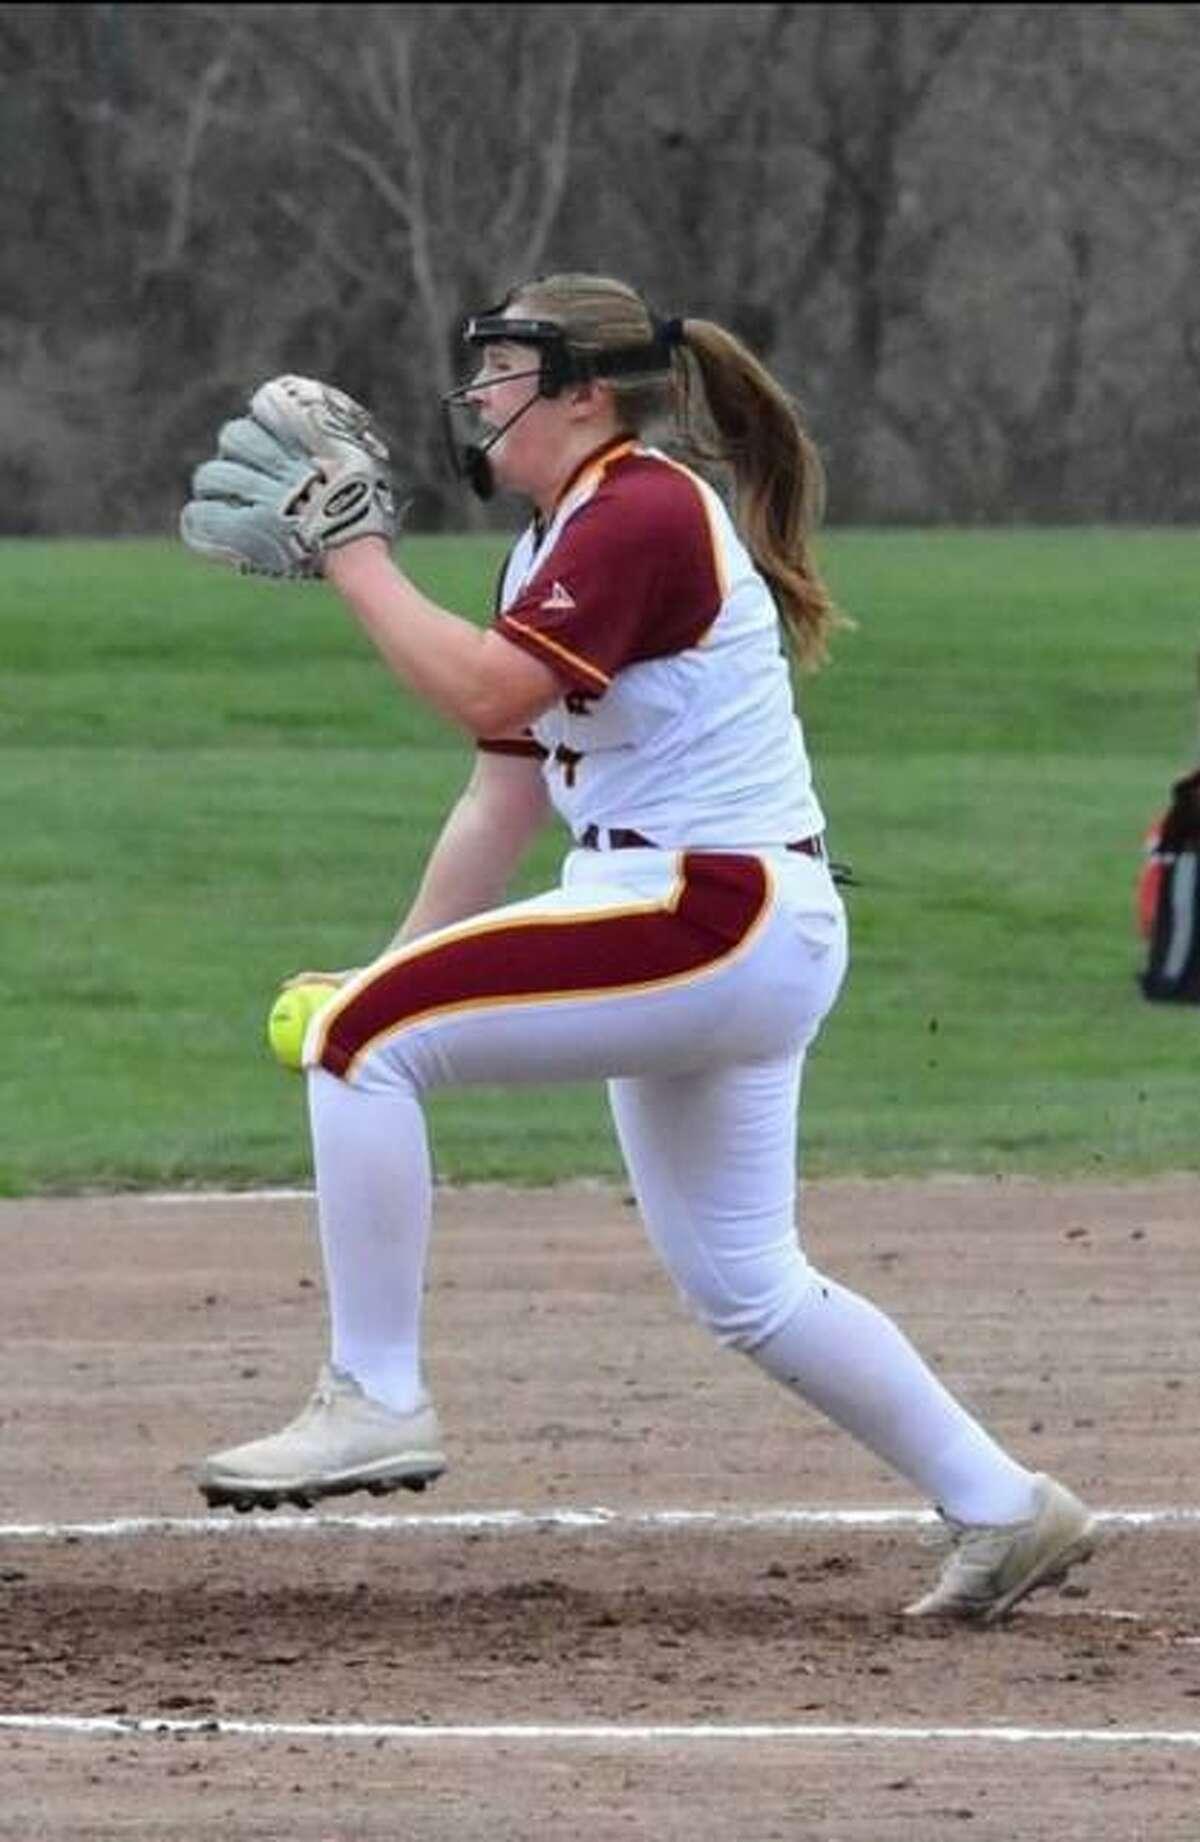 St. Joseph junior Lauren Wasikowski hasn't allowed an earned run. She has struck out 68 batters in six games.